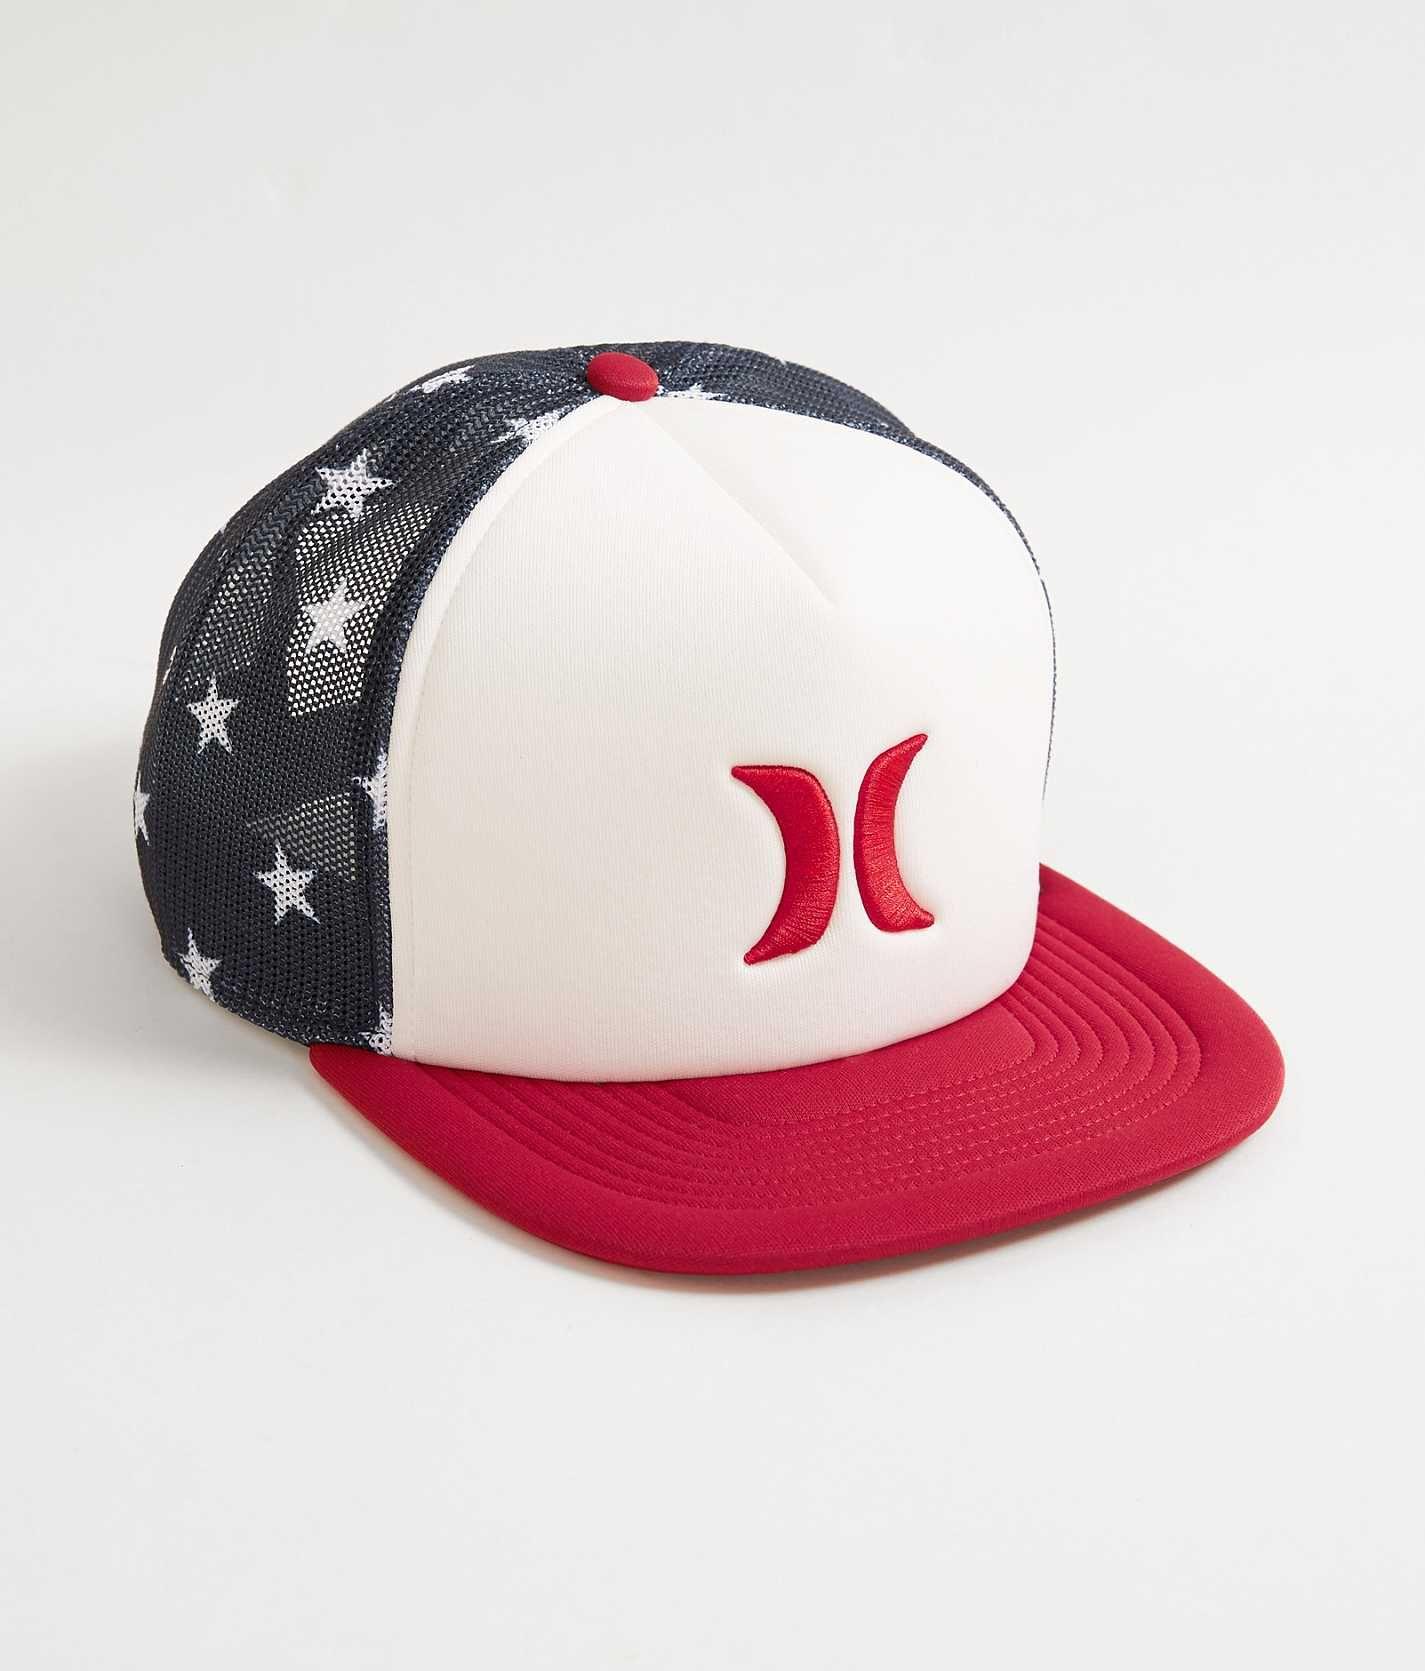 Hurley Blocked Usa Trucker Hat Men S Hats In White Buckle Hats For Men Trucker Hat Mens Snapback Hats